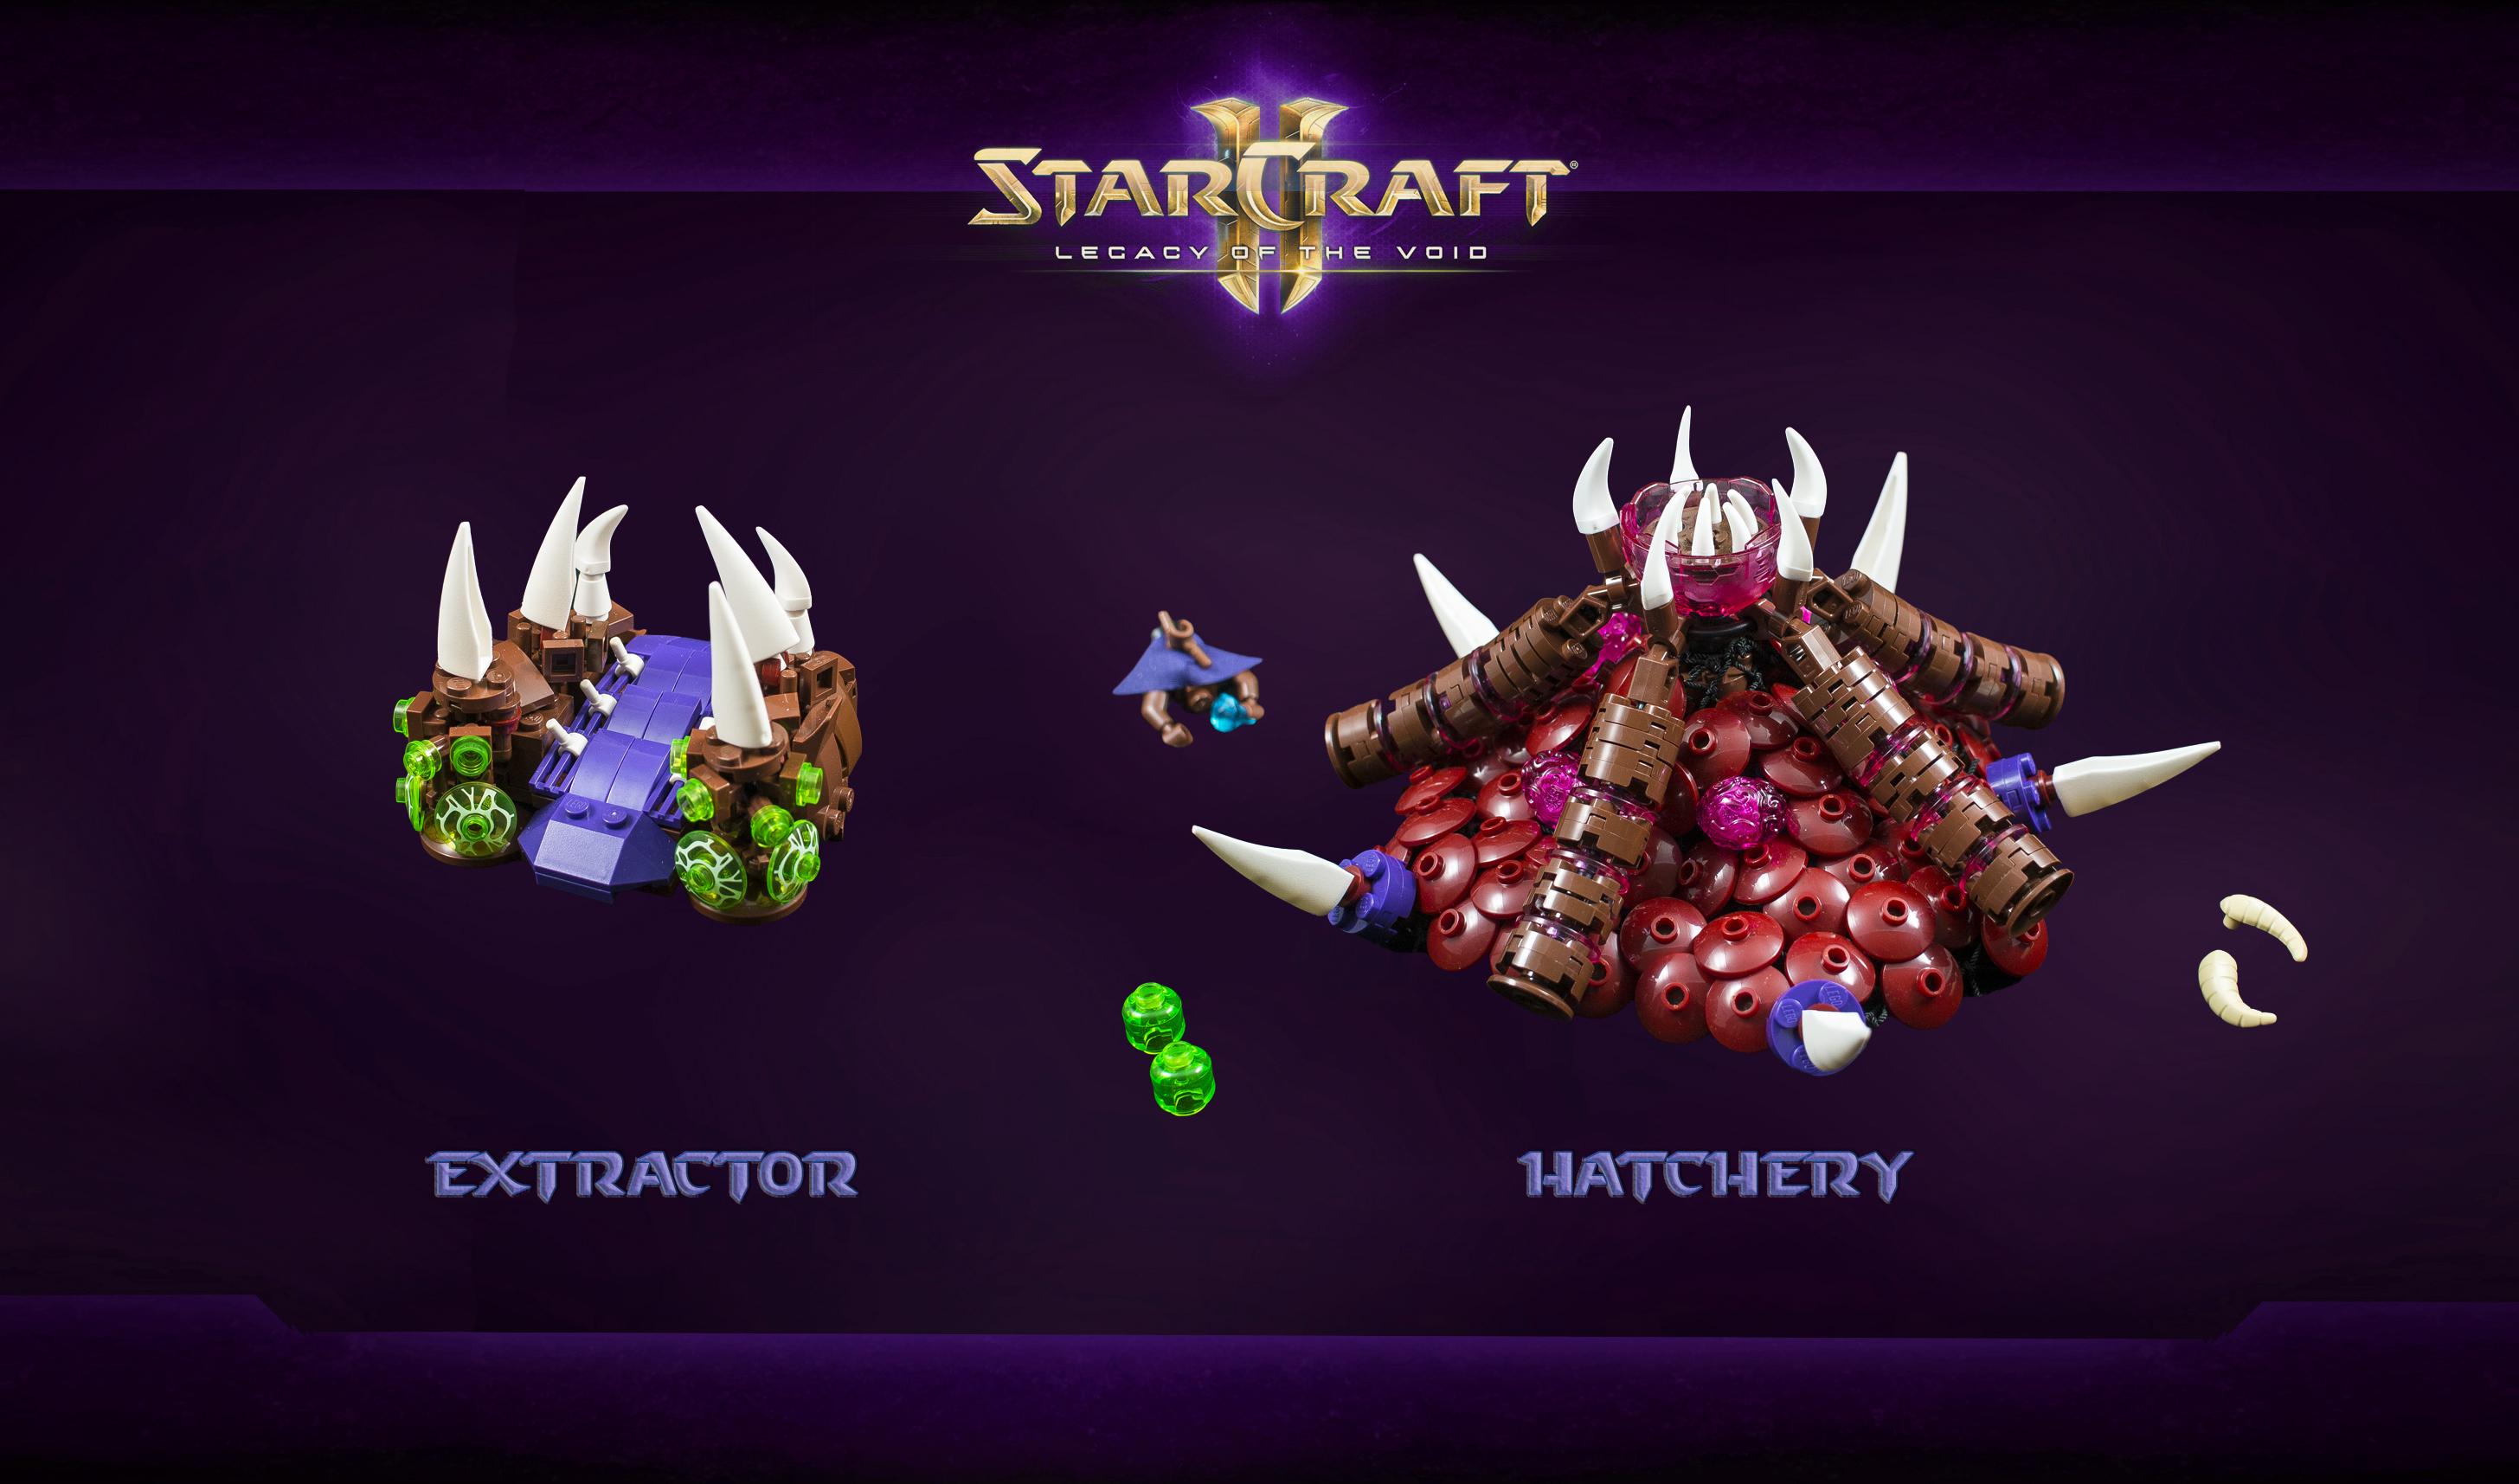 Wallpaper : SC, LEGO, StarCraft, blizzard, sc2, hatchery, moc, drone